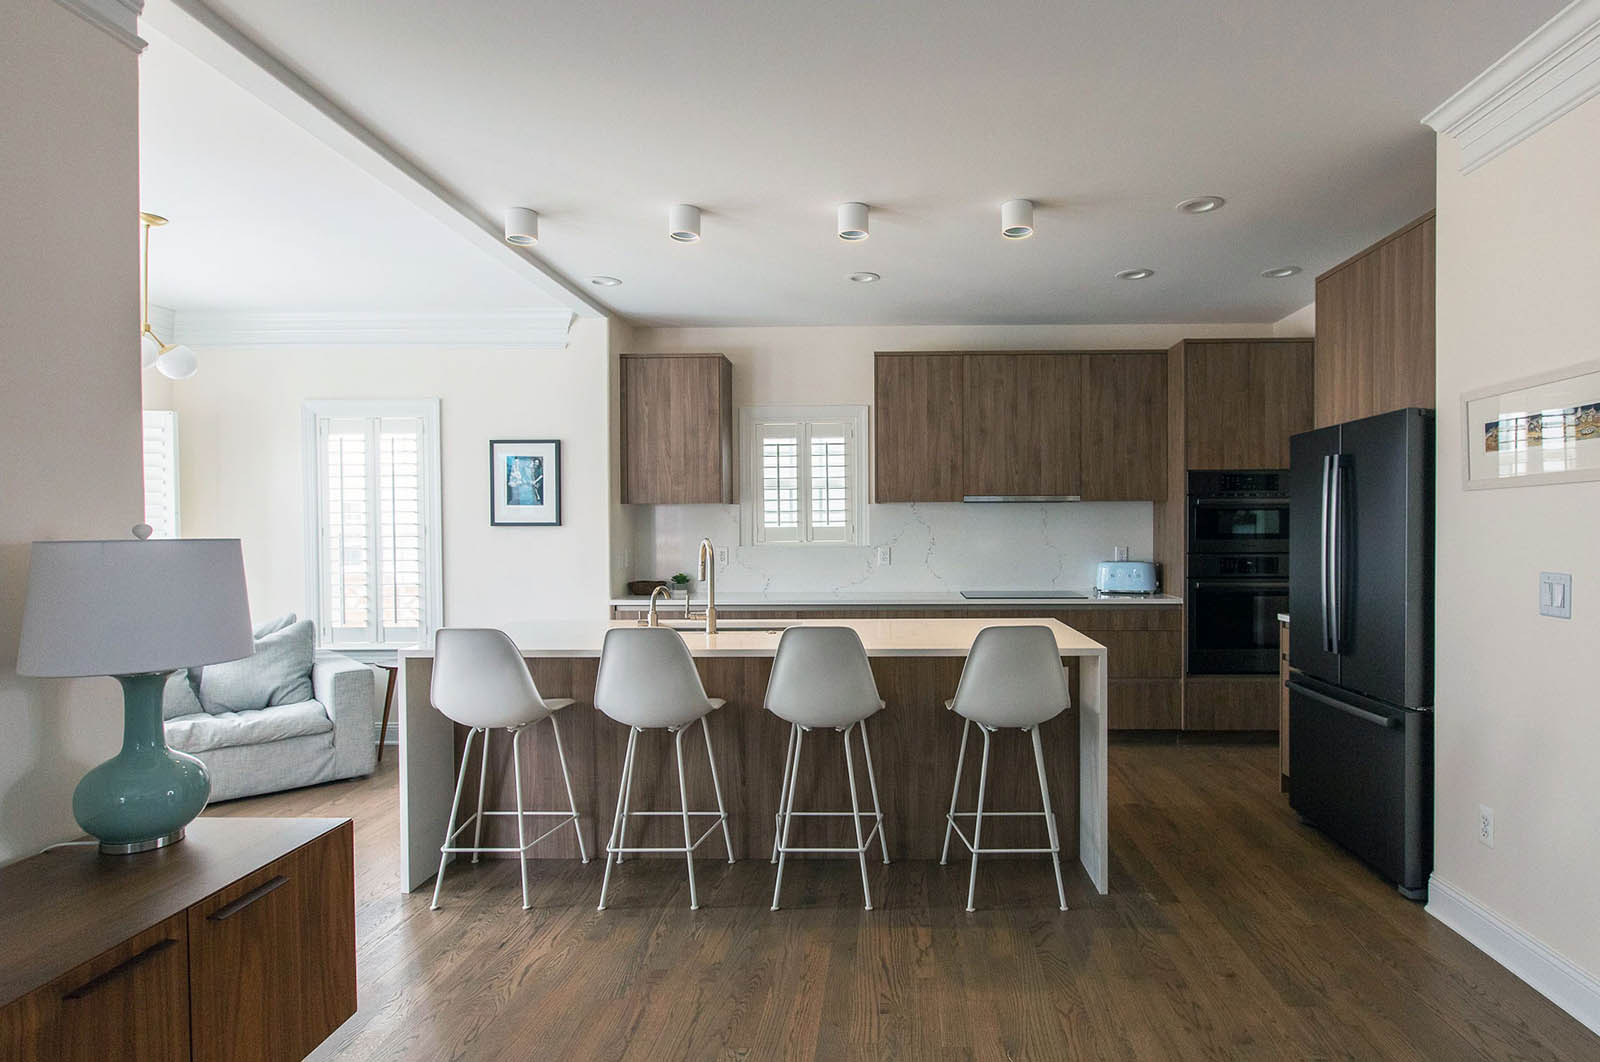 Alton Kitchen Remodel and Design